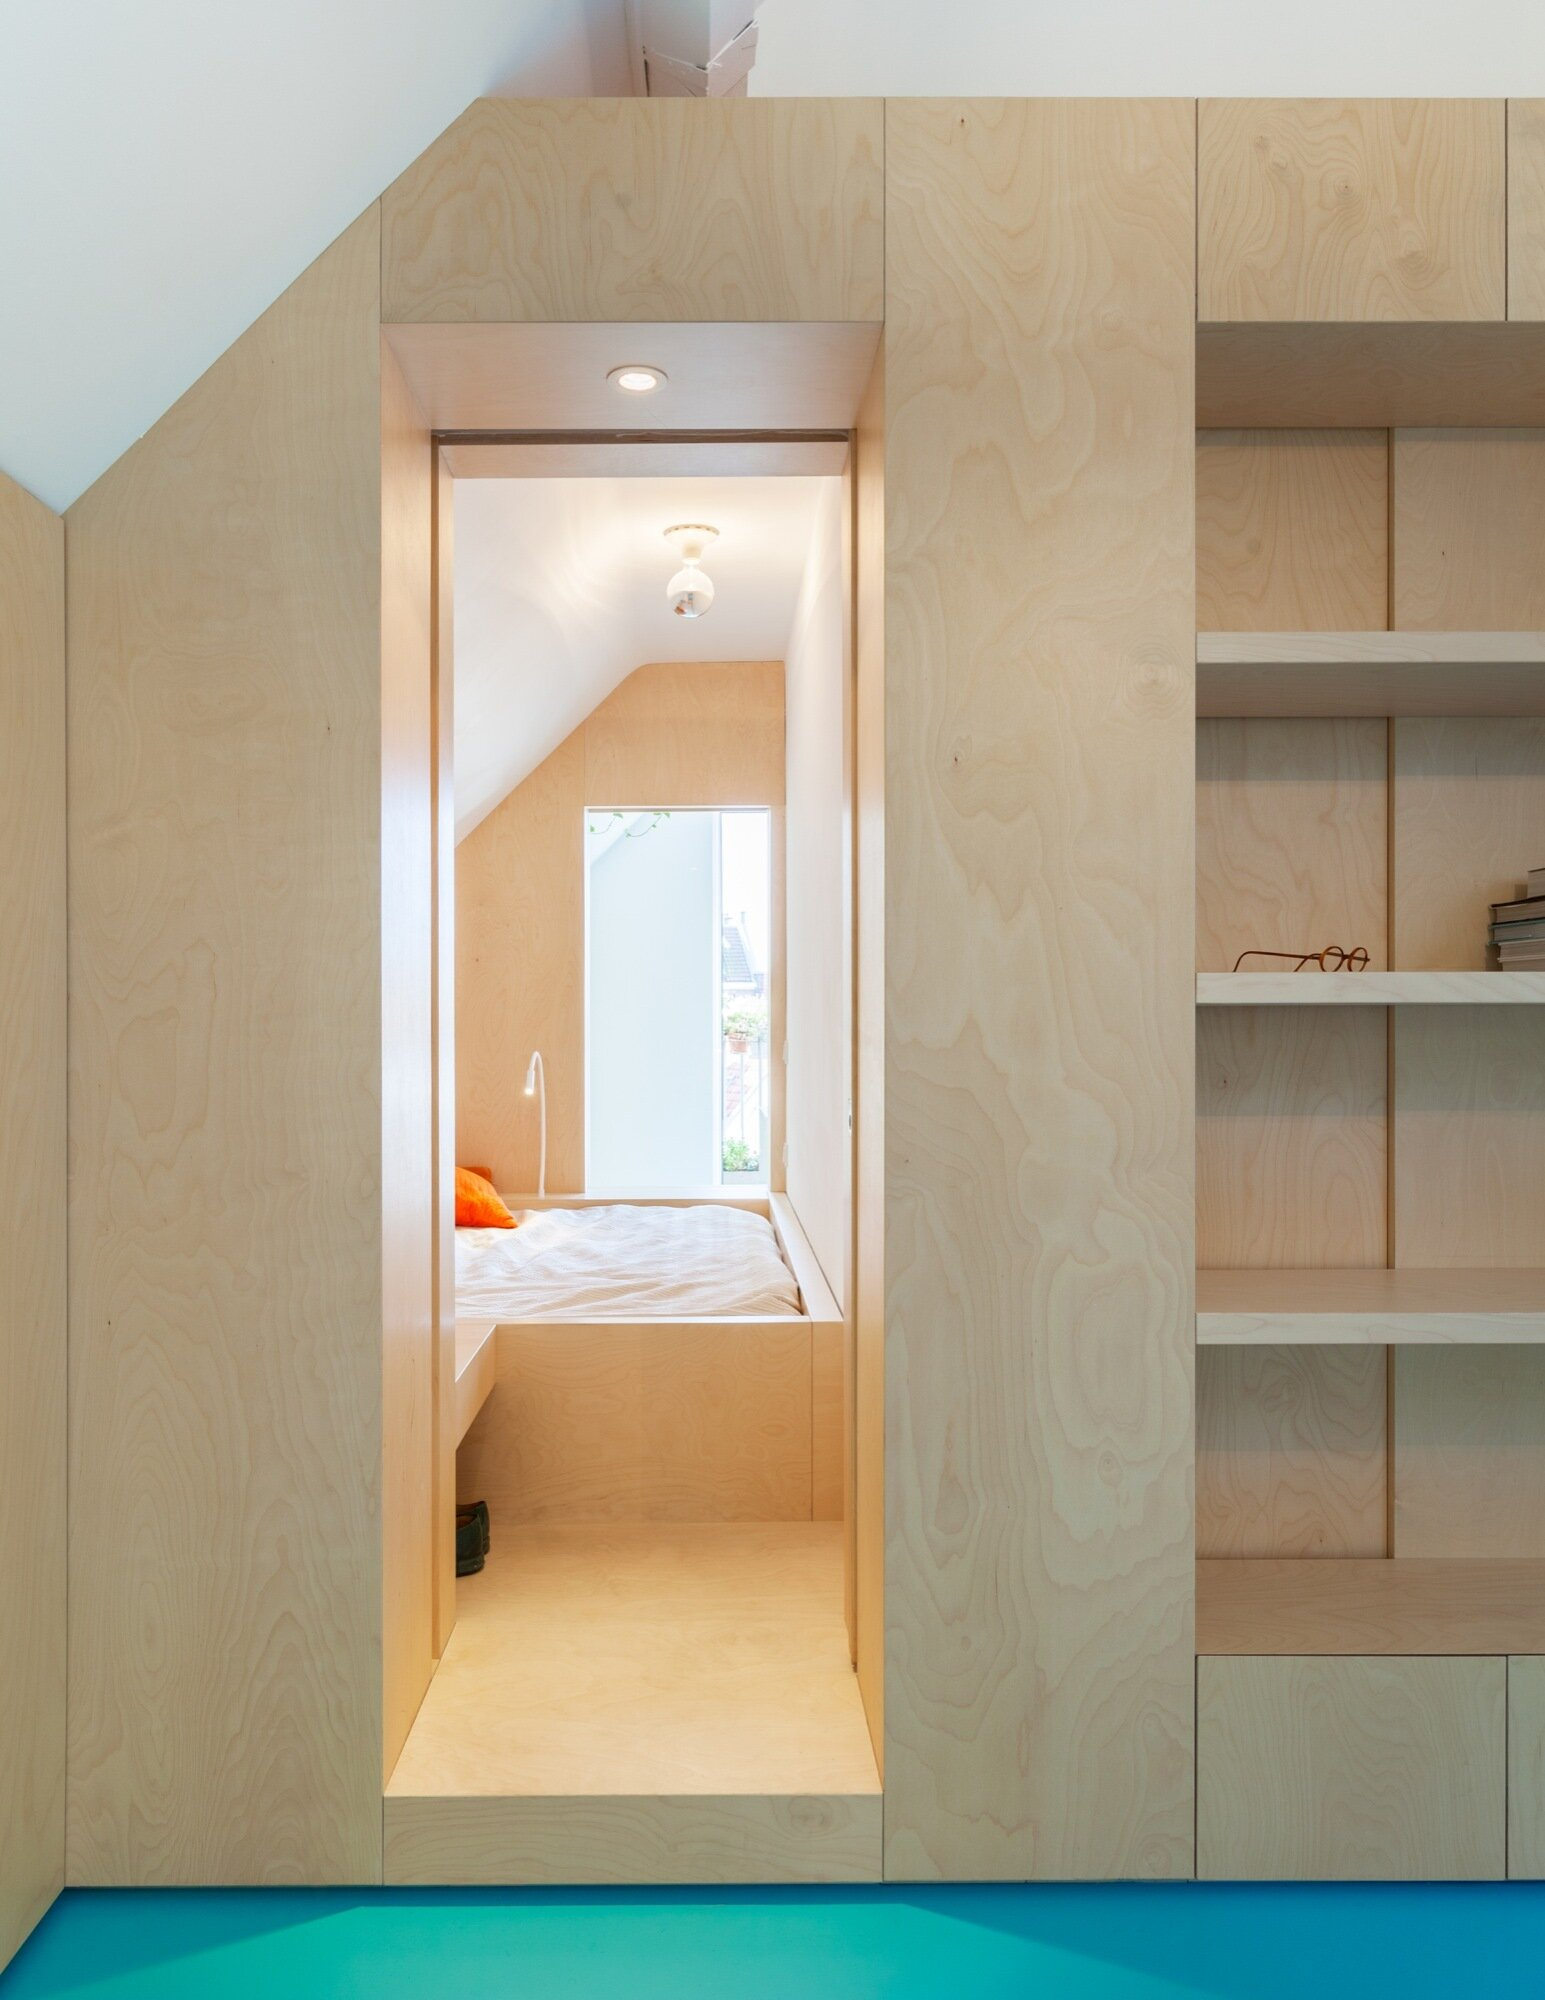 Amsterdam Urban Loft - Bureau Fraai - Amsterdam - Leading to Bedroom - Humble Homes